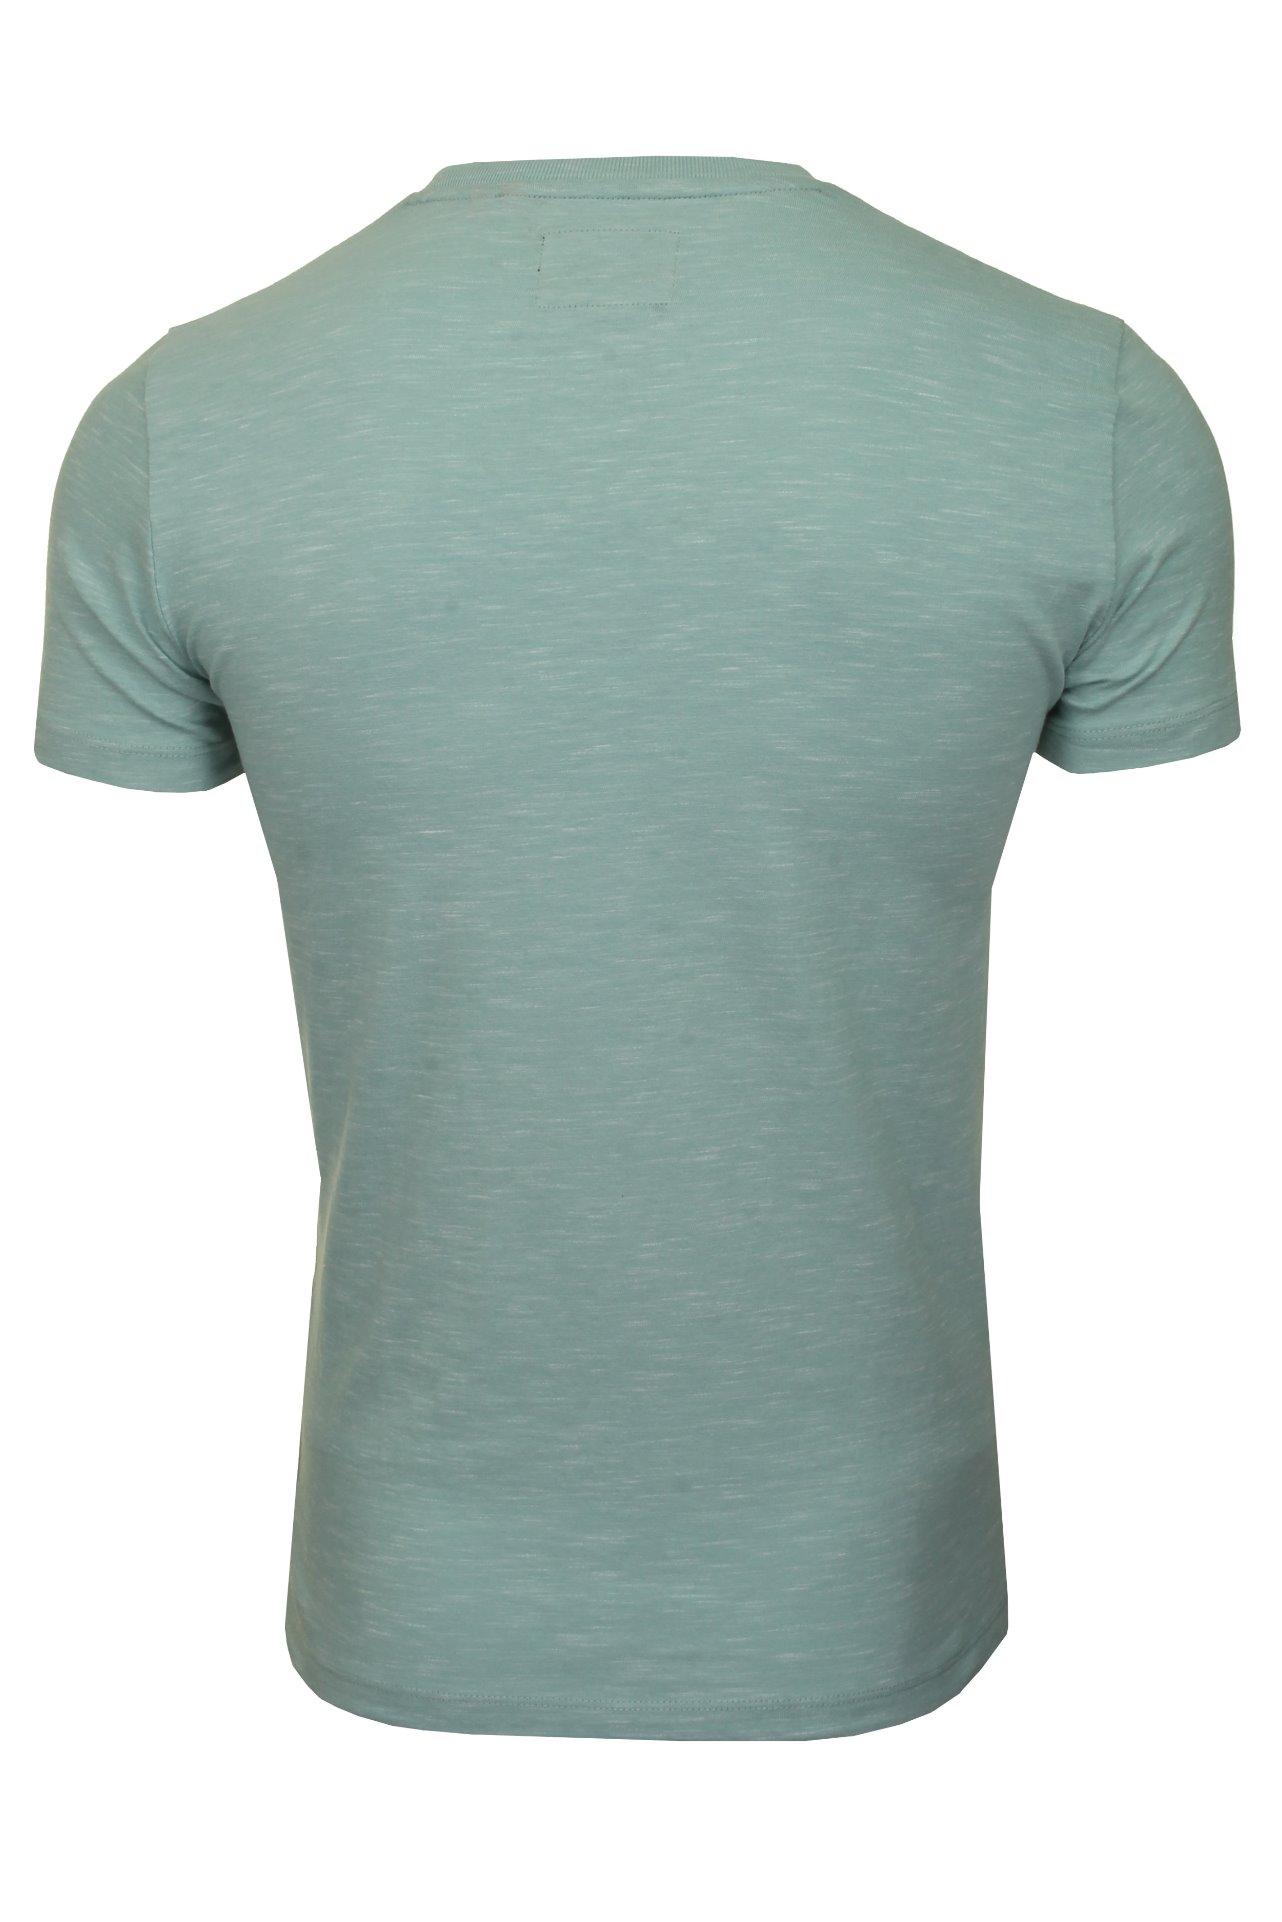 Details about  /Superdry Mens T-Shirt /'Vintage Emb Crew/'